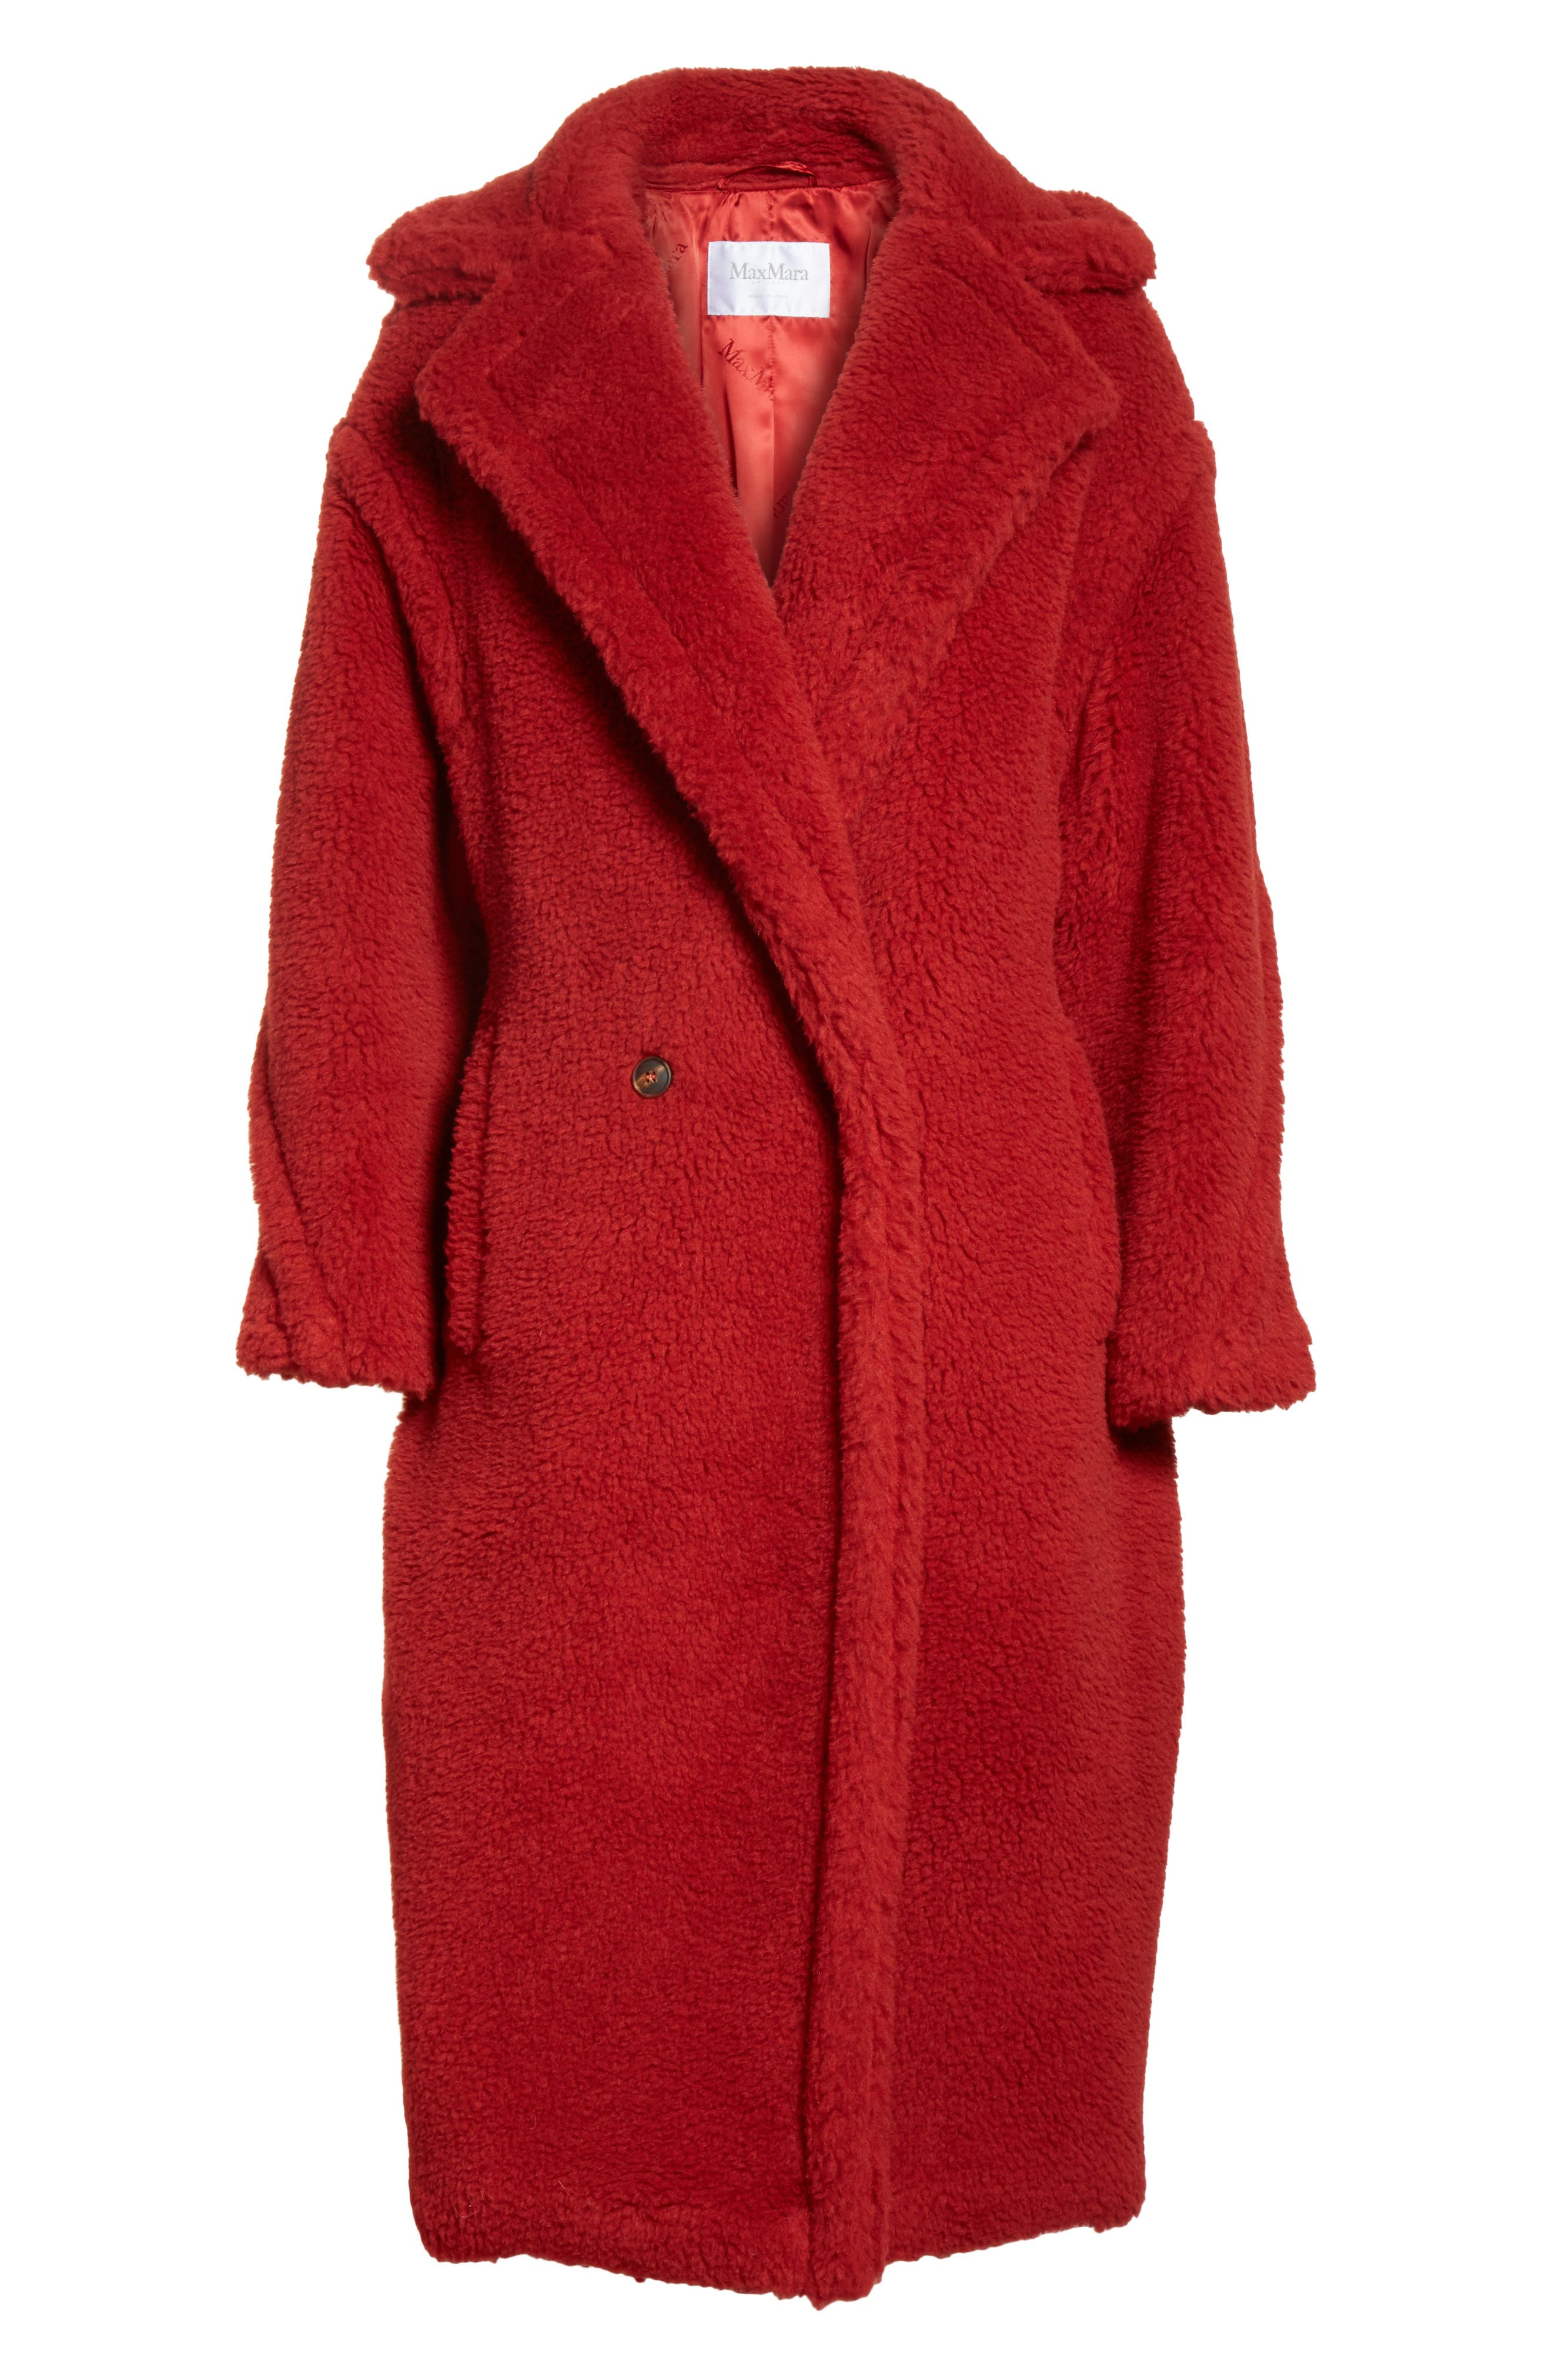 Pappino Camel Hair & Silk Coat,                             Alternate thumbnail 5, color,                             614